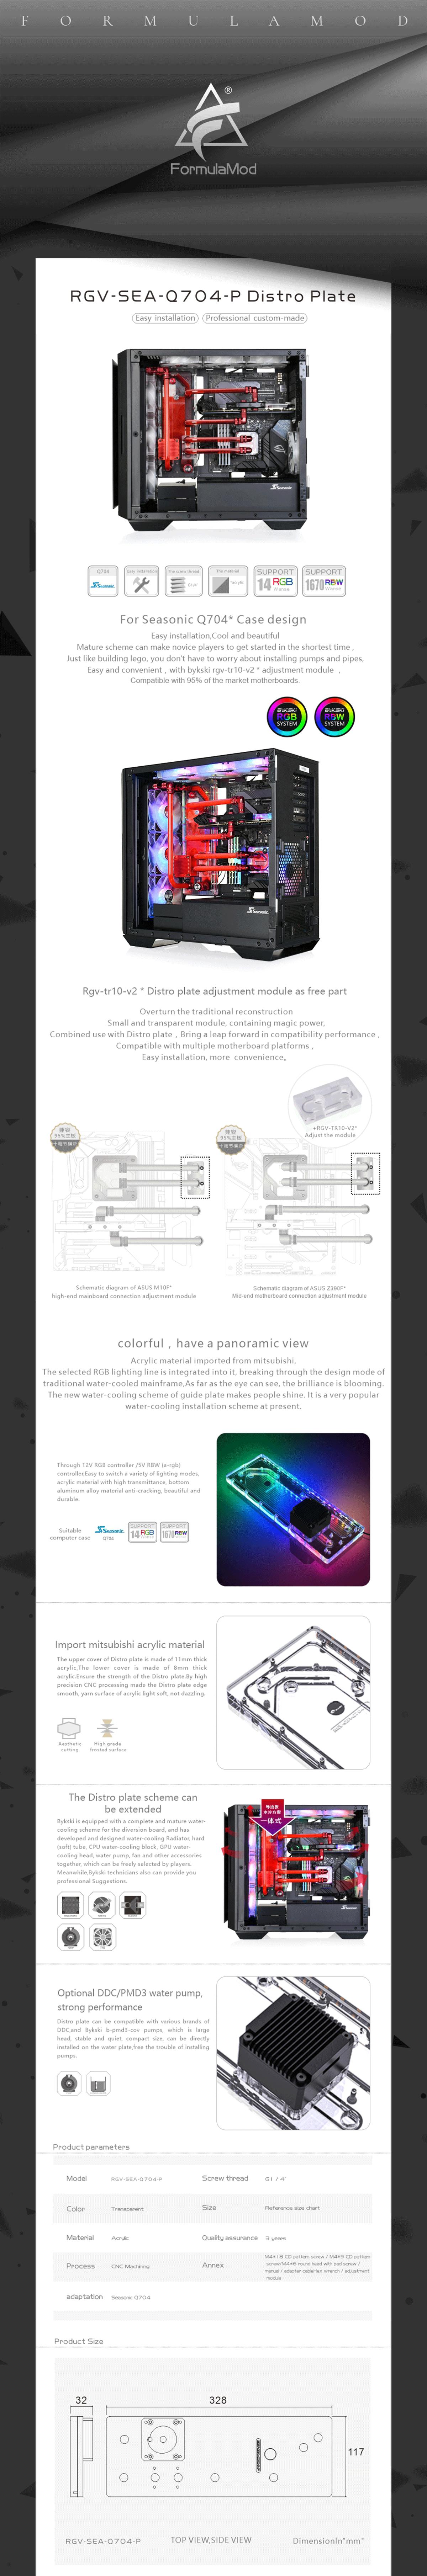 Bykski Waterway Board Kit RGV-SEA-Q704-P Distro Plate For Seasonic SYNCRO Q704 Case Acrylic Tranperant  For  Water Cooling Loop